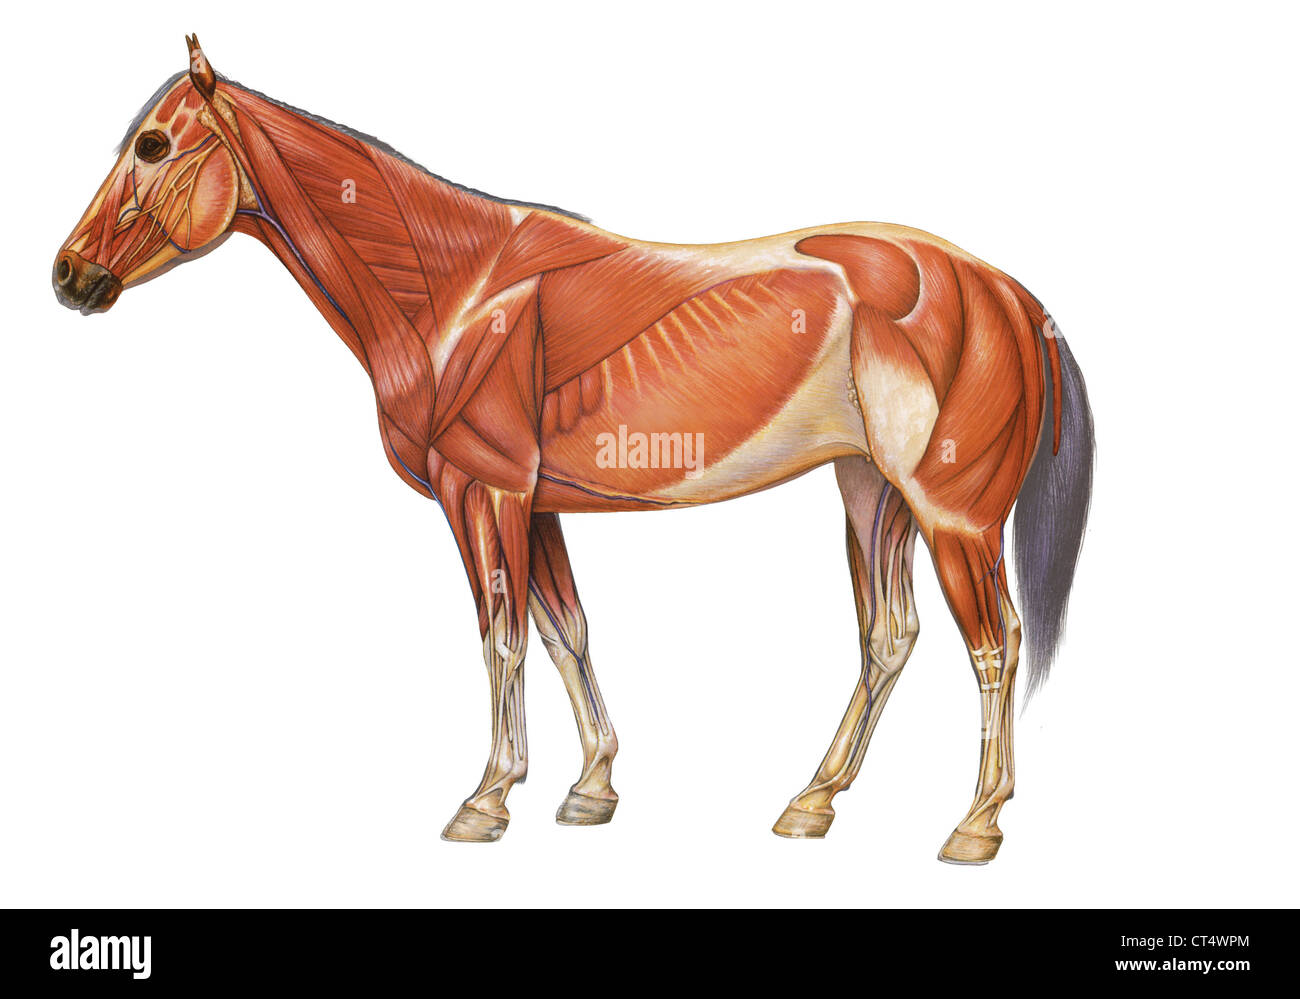 HORSE ANATOMY, DRAWING Stock Photo: 49280524 - Alamy